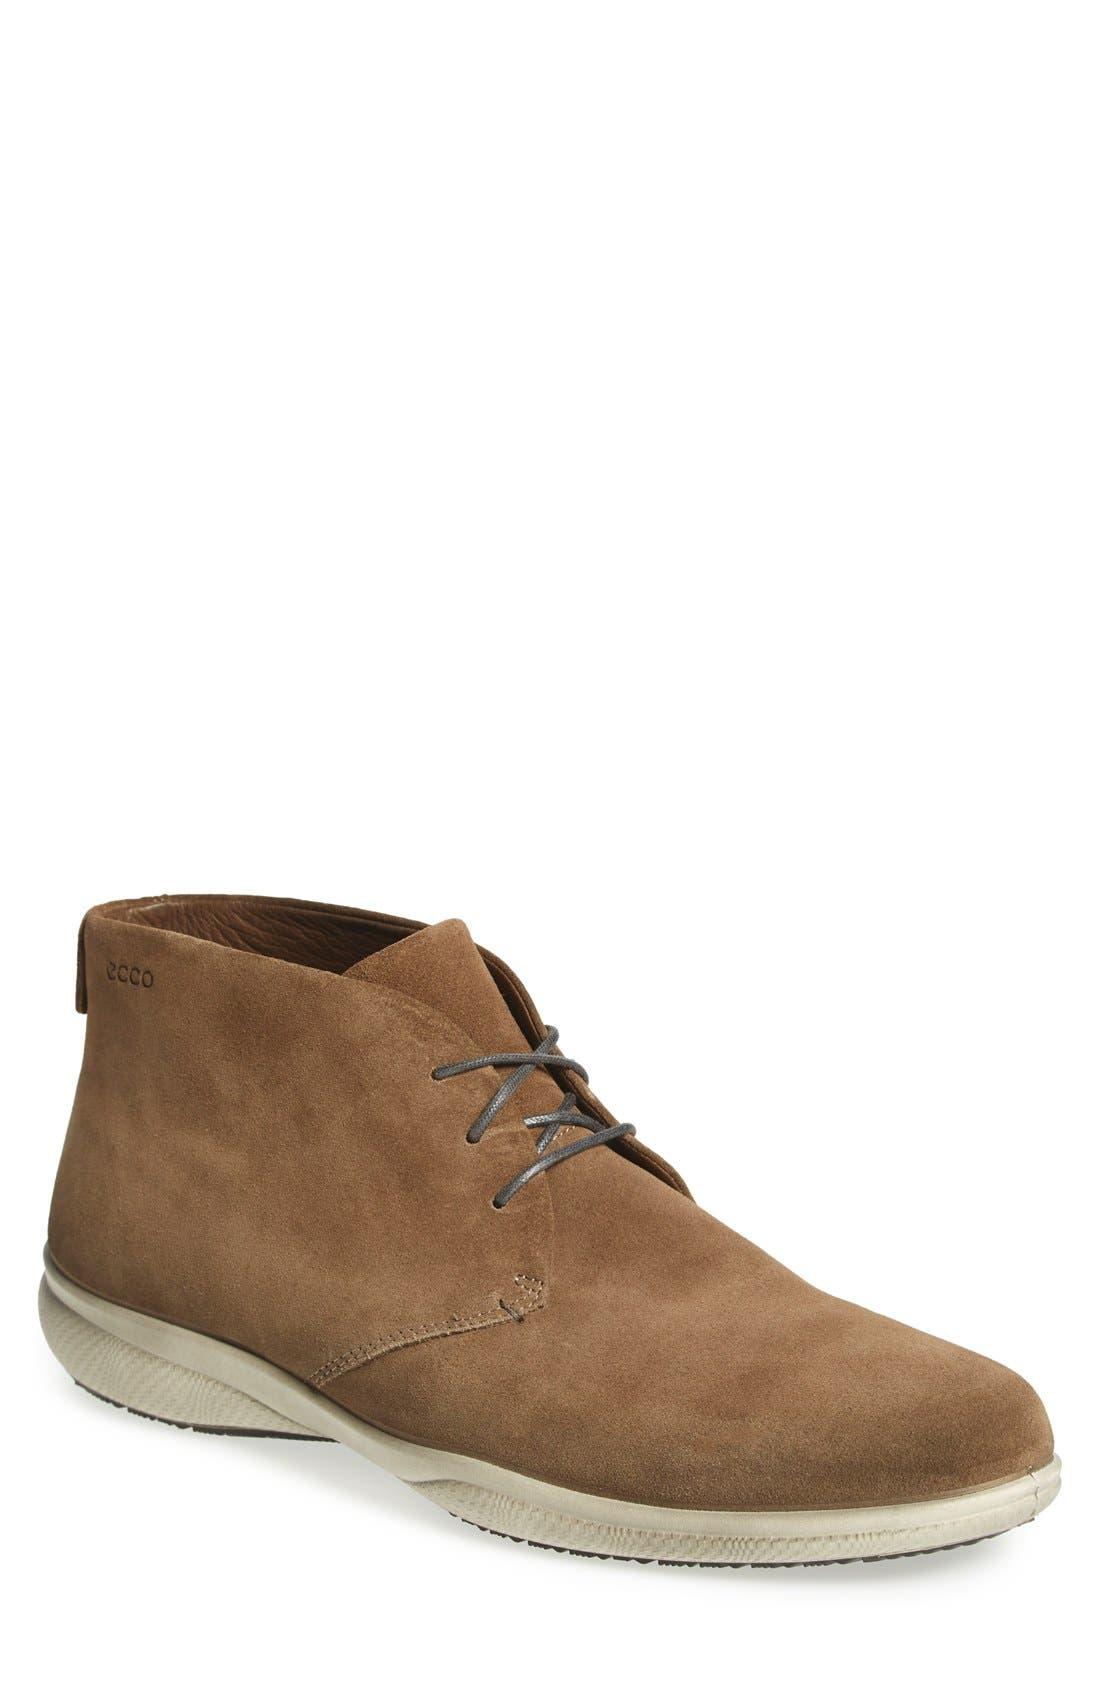 'Grenoble' Chukka Boot,                             Main thumbnail 1, color,                             Birch Leather